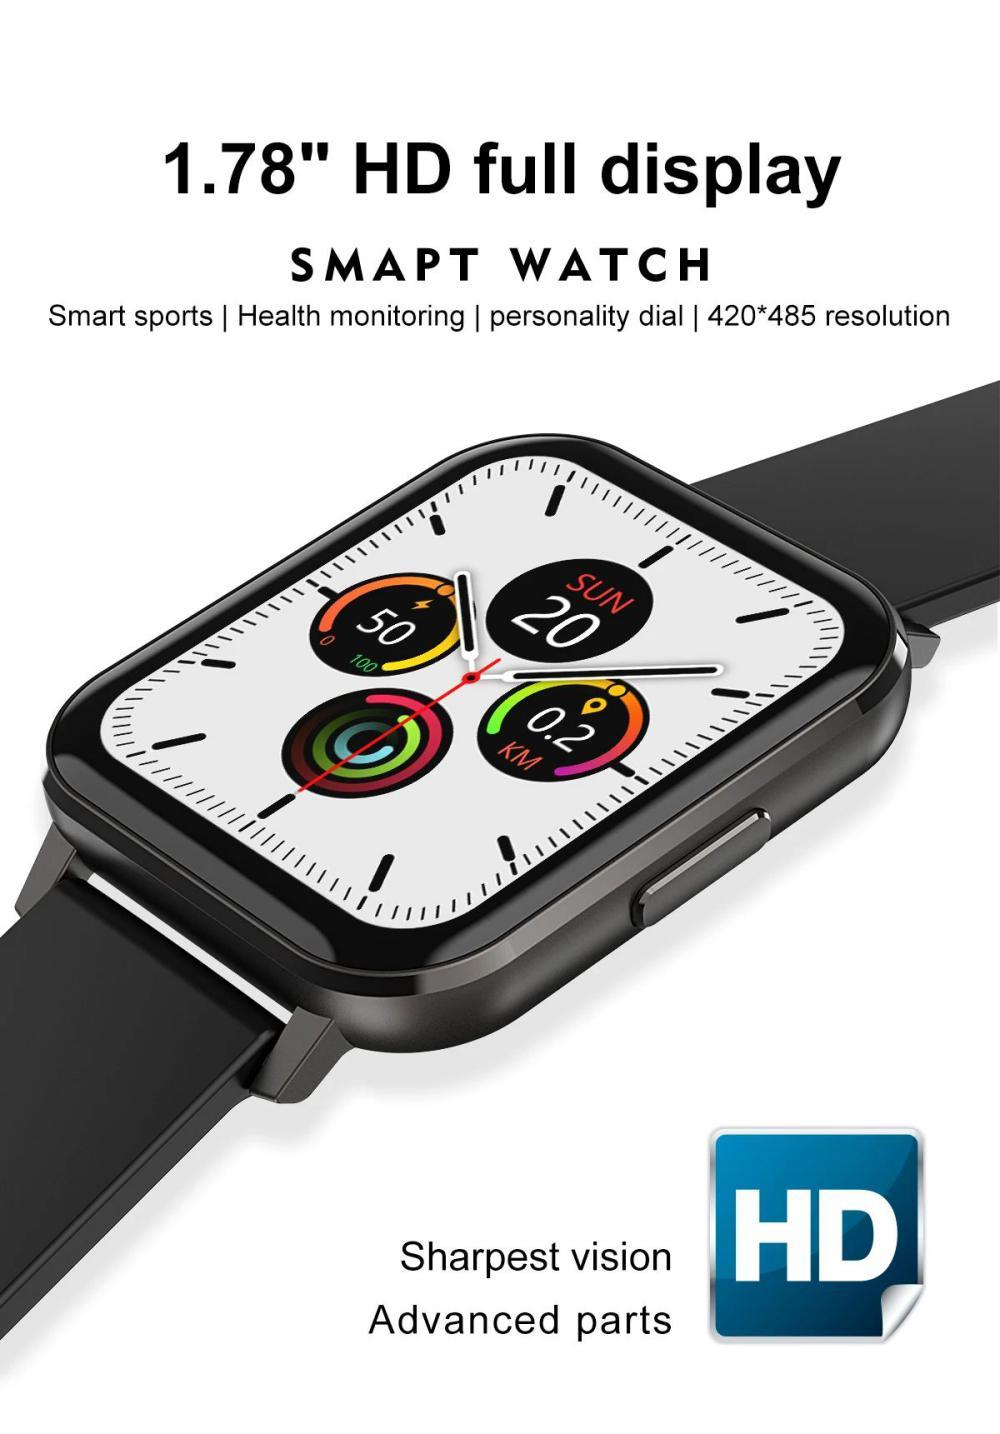 Dt No I Dt X Rectangular Full Display Smartwatch (8)